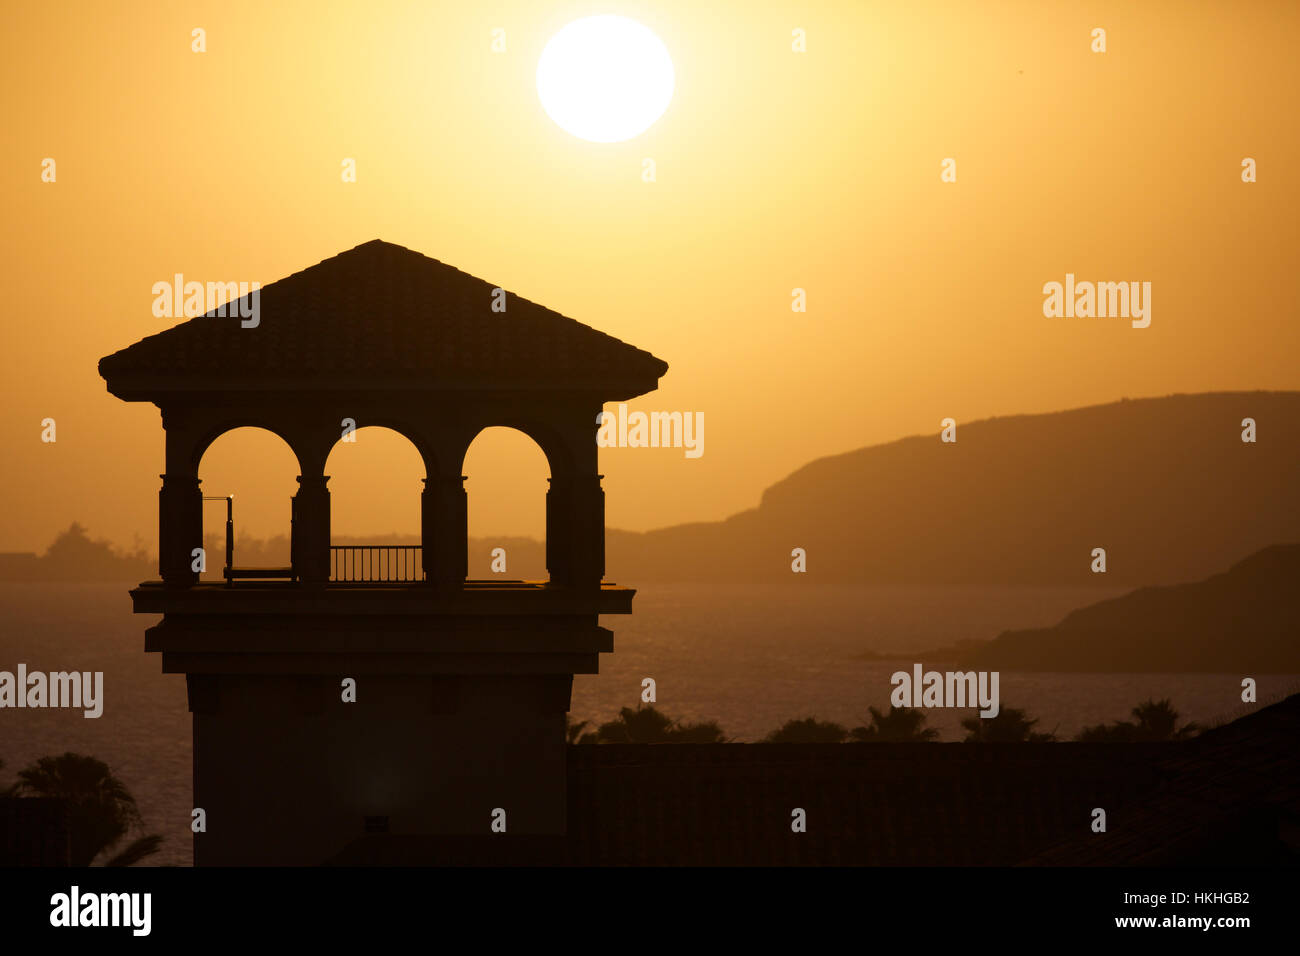 Silhouette der gebauten Struktur während des Sonnenuntergangs. Fluss, Dämmerung, Naturidylle. Stockbild